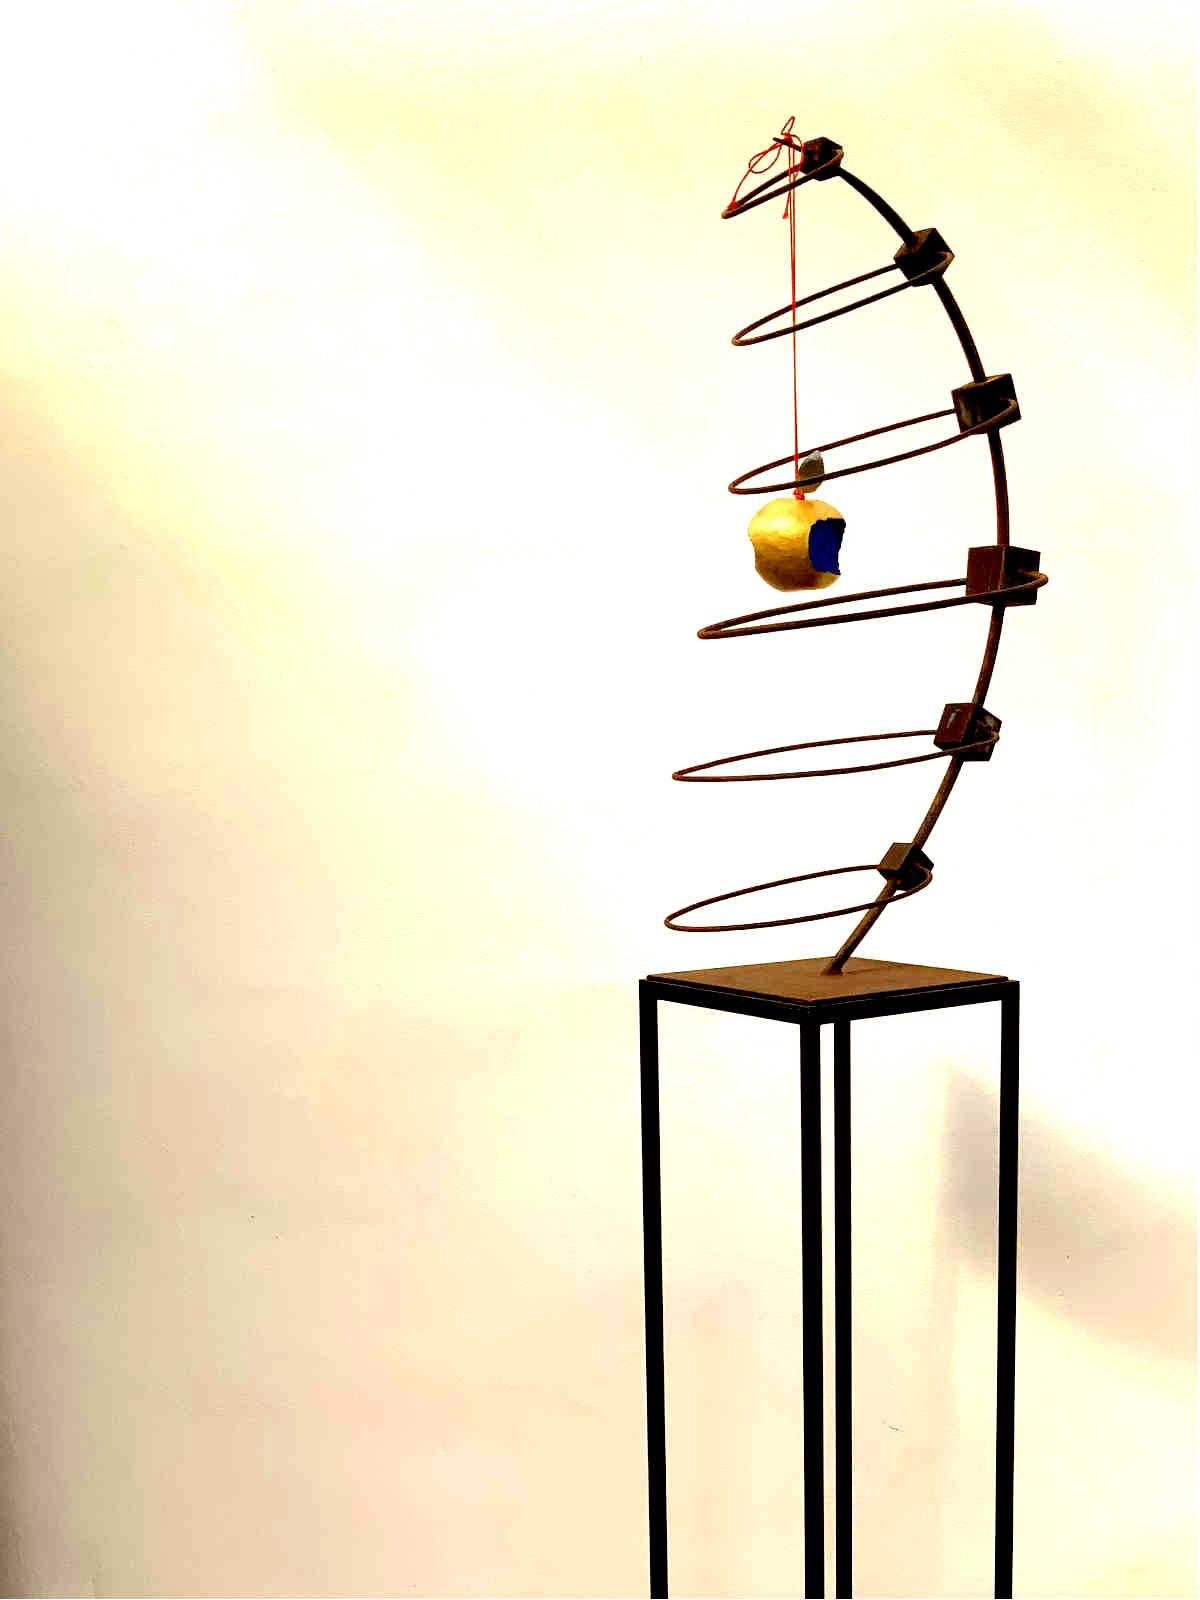 escultura-acero-corten-tenerife